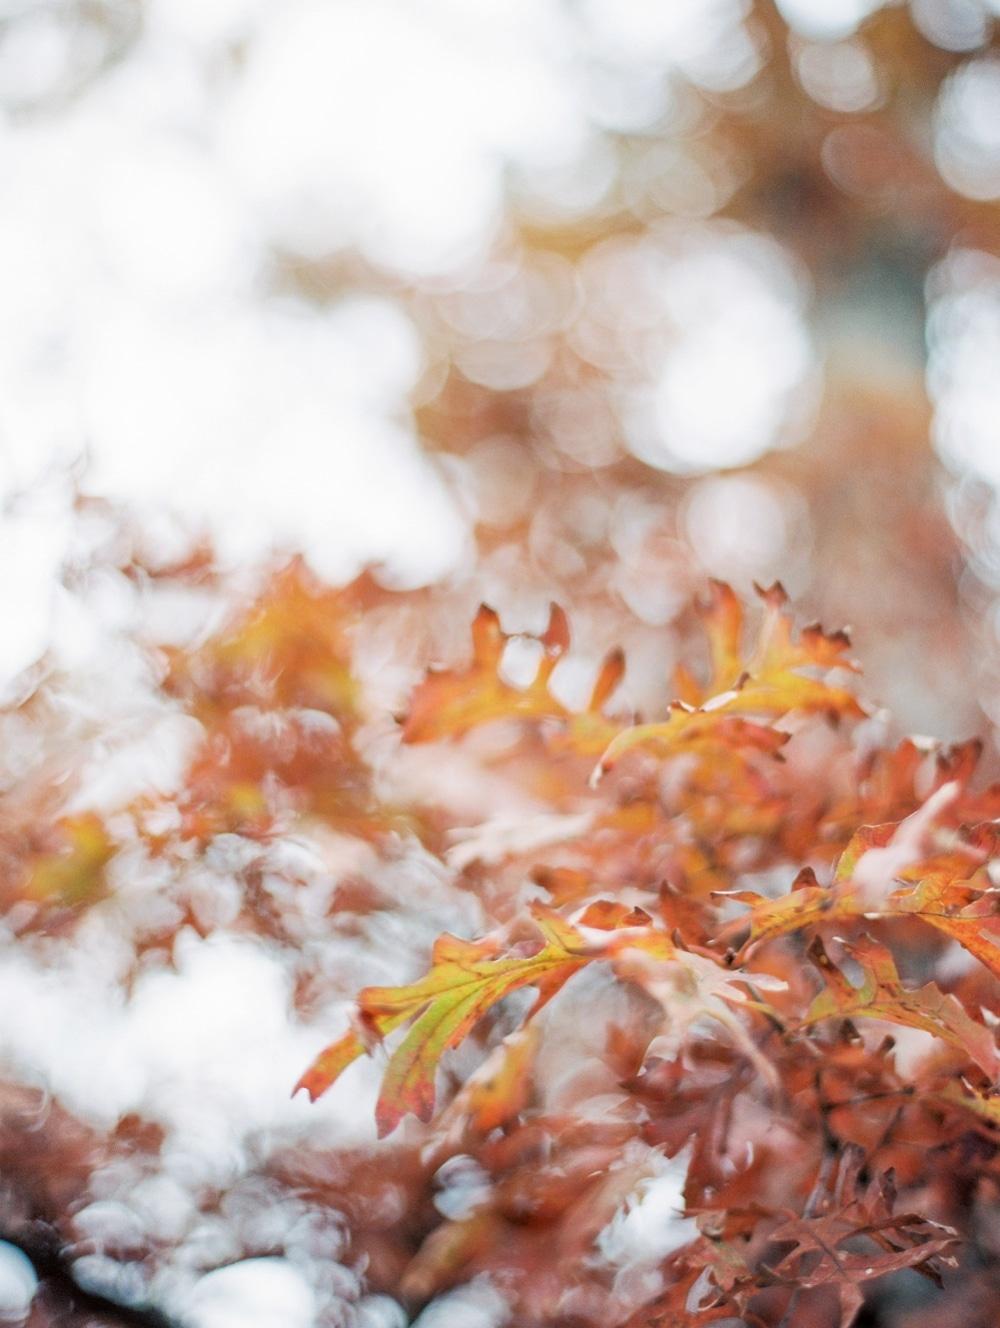 Kristin-La-Voie-Photography-morton-arboretum-chicago-wedding-photographer-98